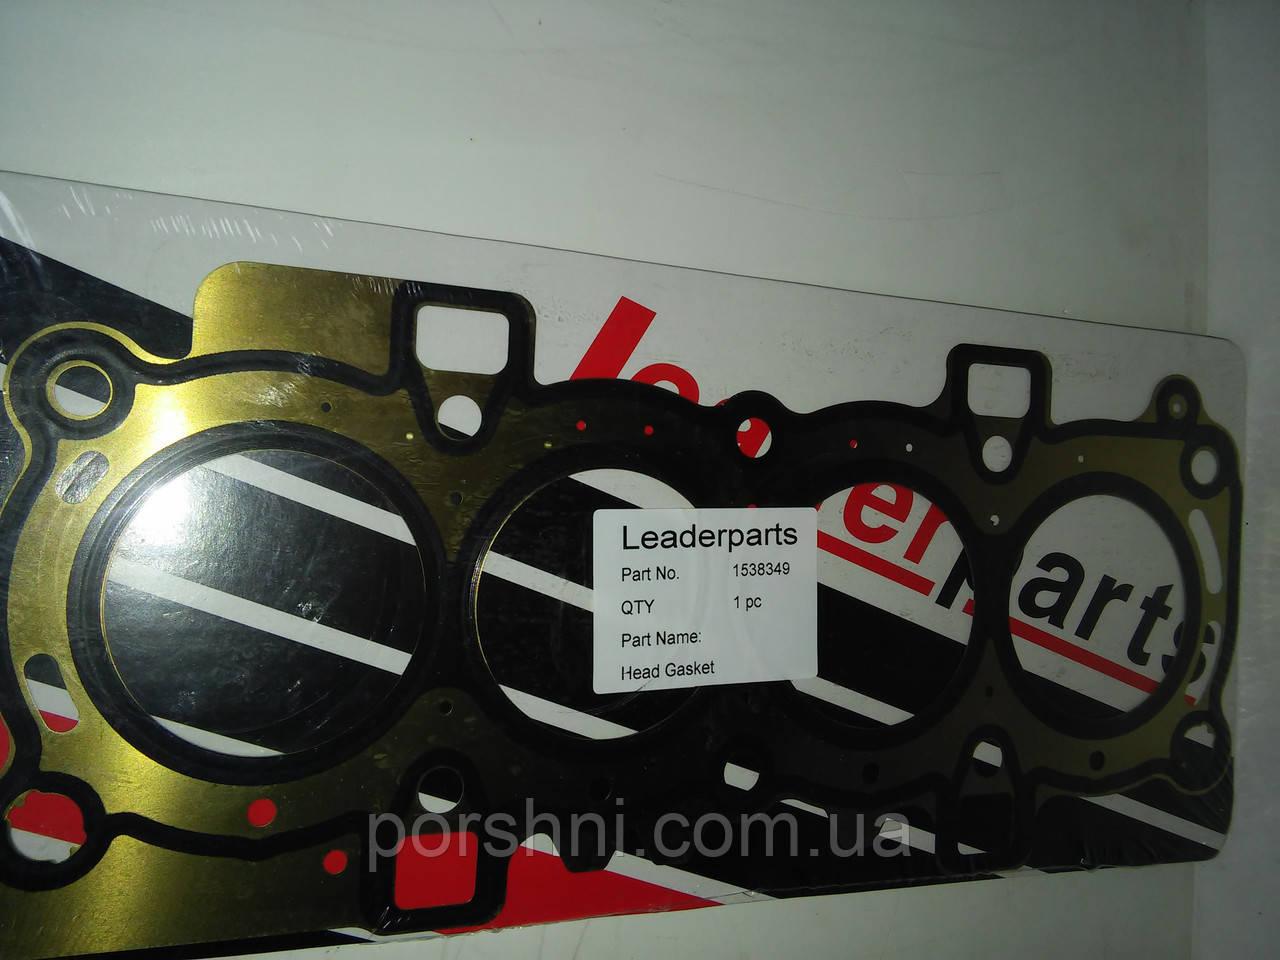 Прокладка  головки Ford Fiesta  1.25  2008 >  Leaderparts  1538349